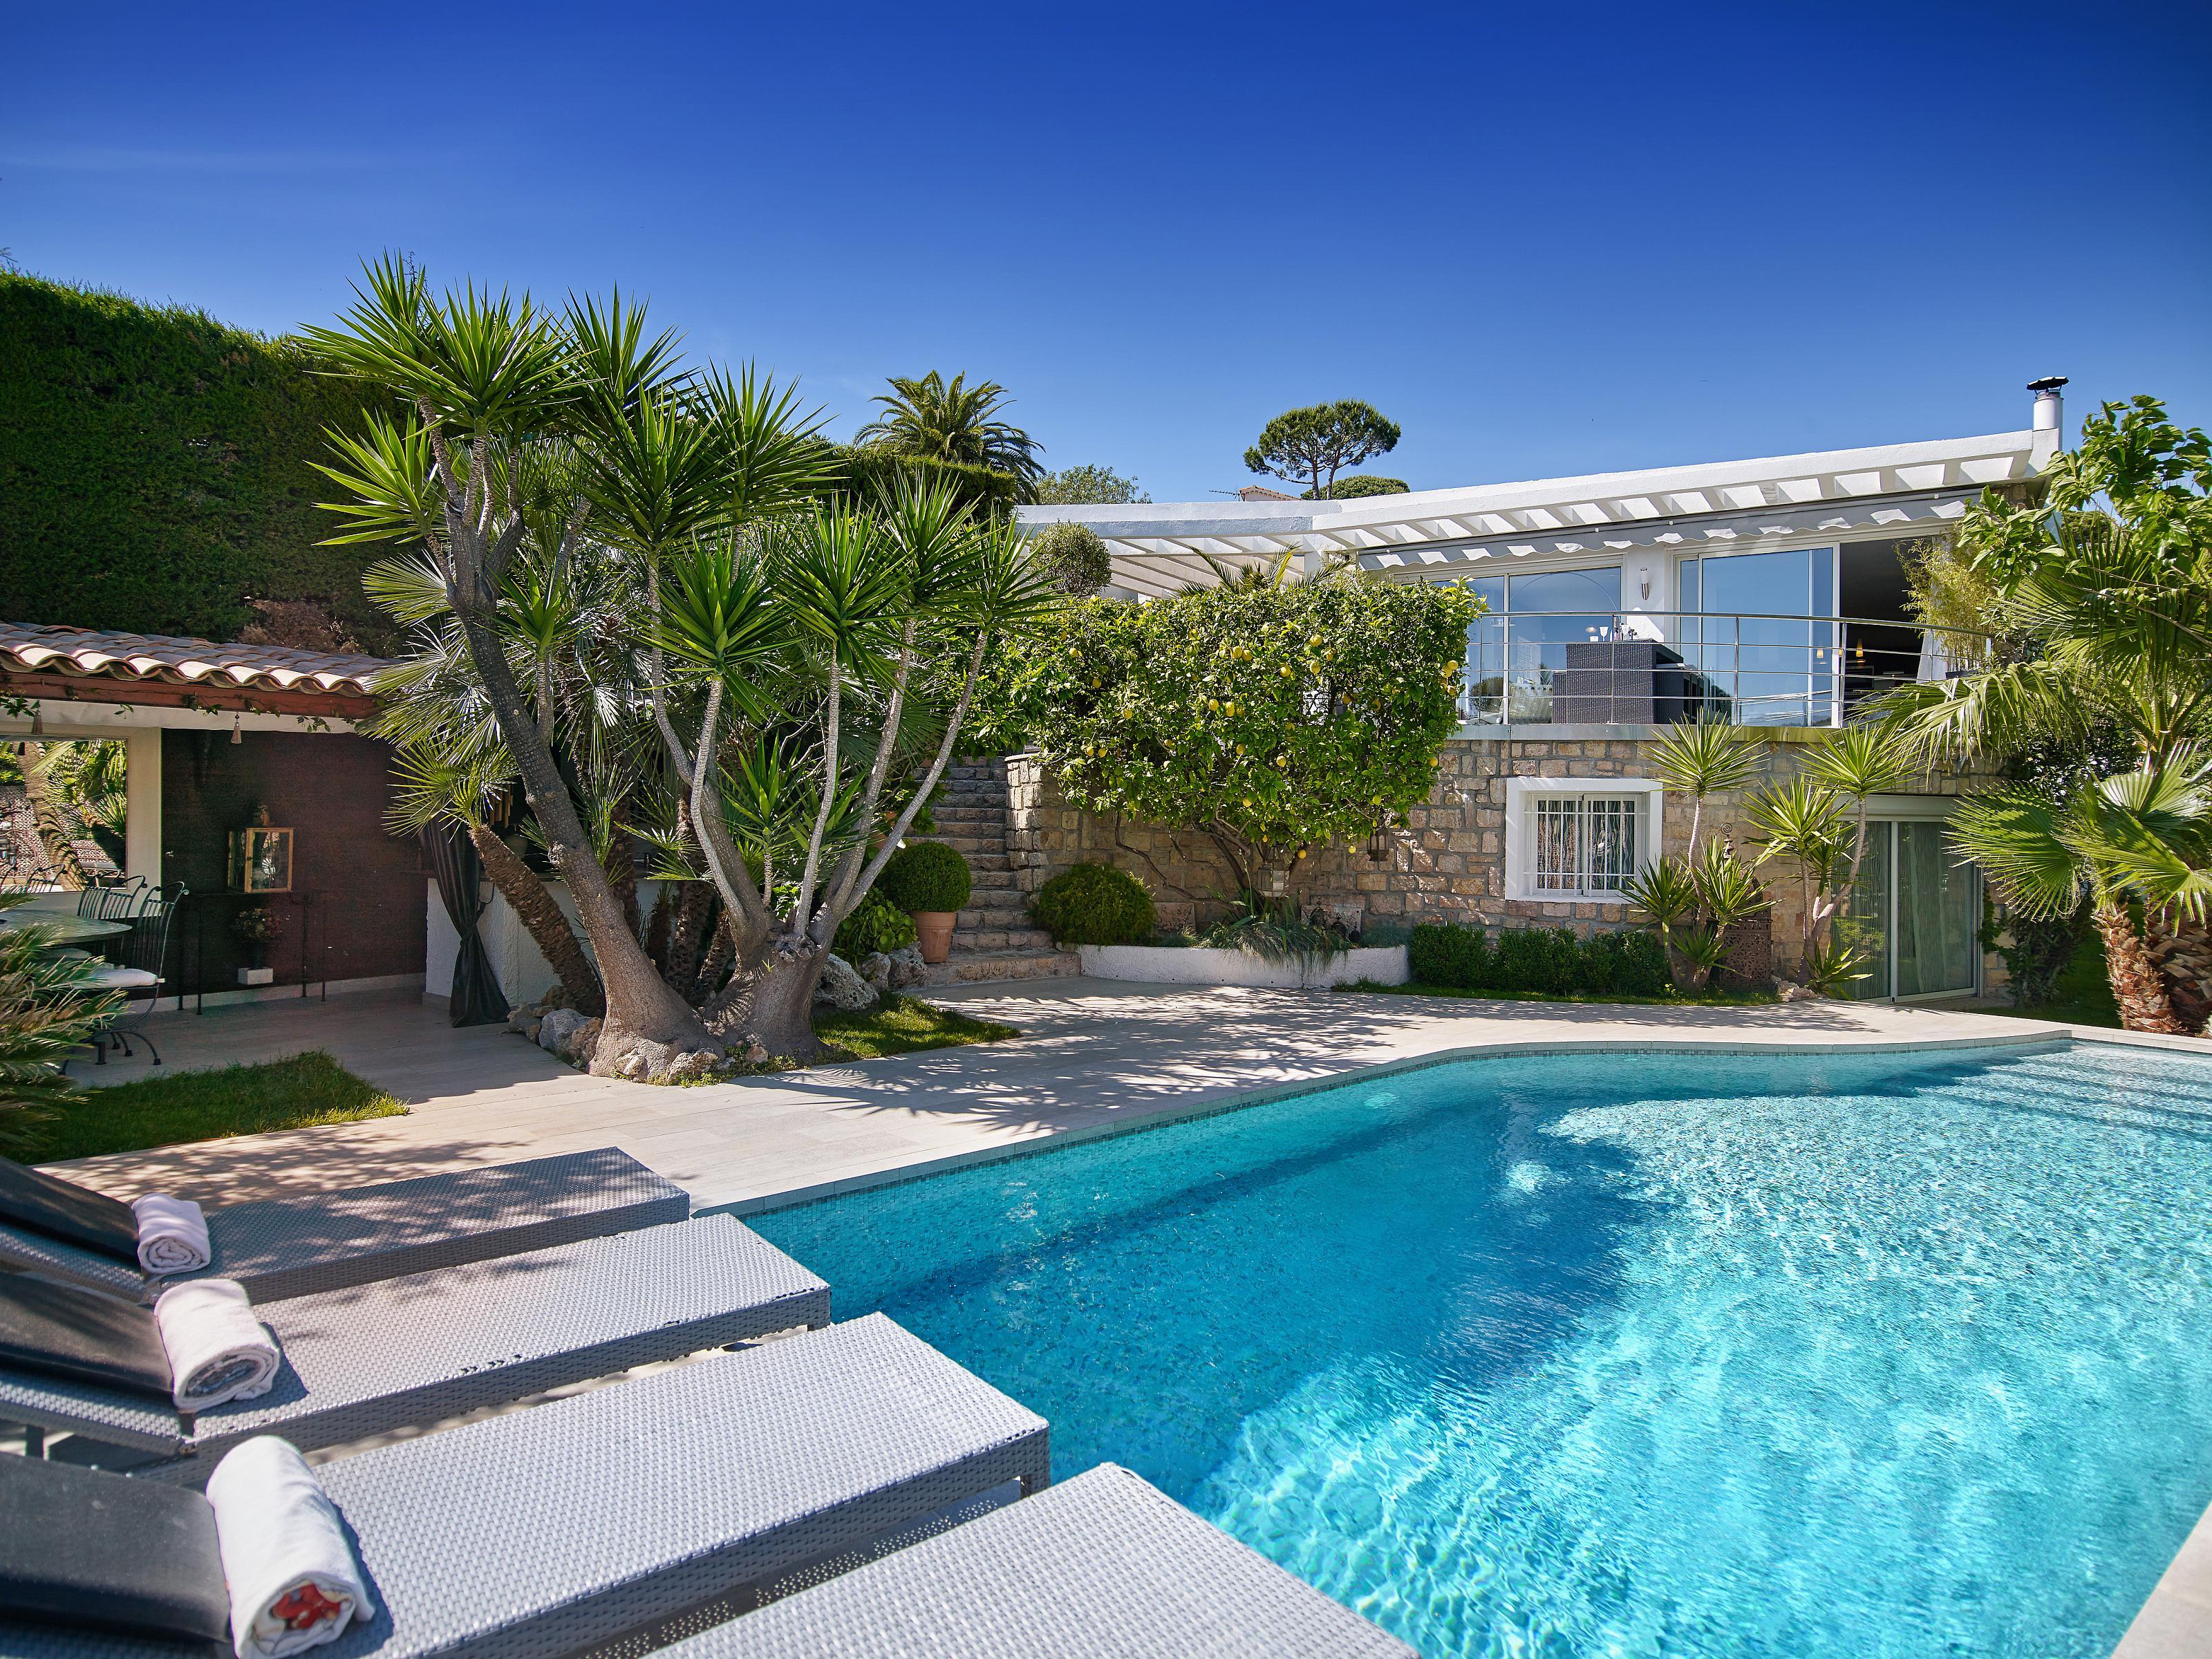 独户住宅 为 销售 在 Modern villa in Cannes only a short stroll to the centre and down to the beaches Cannes, 普罗旺斯阿尔卑斯蓝色海岸 06400 法国